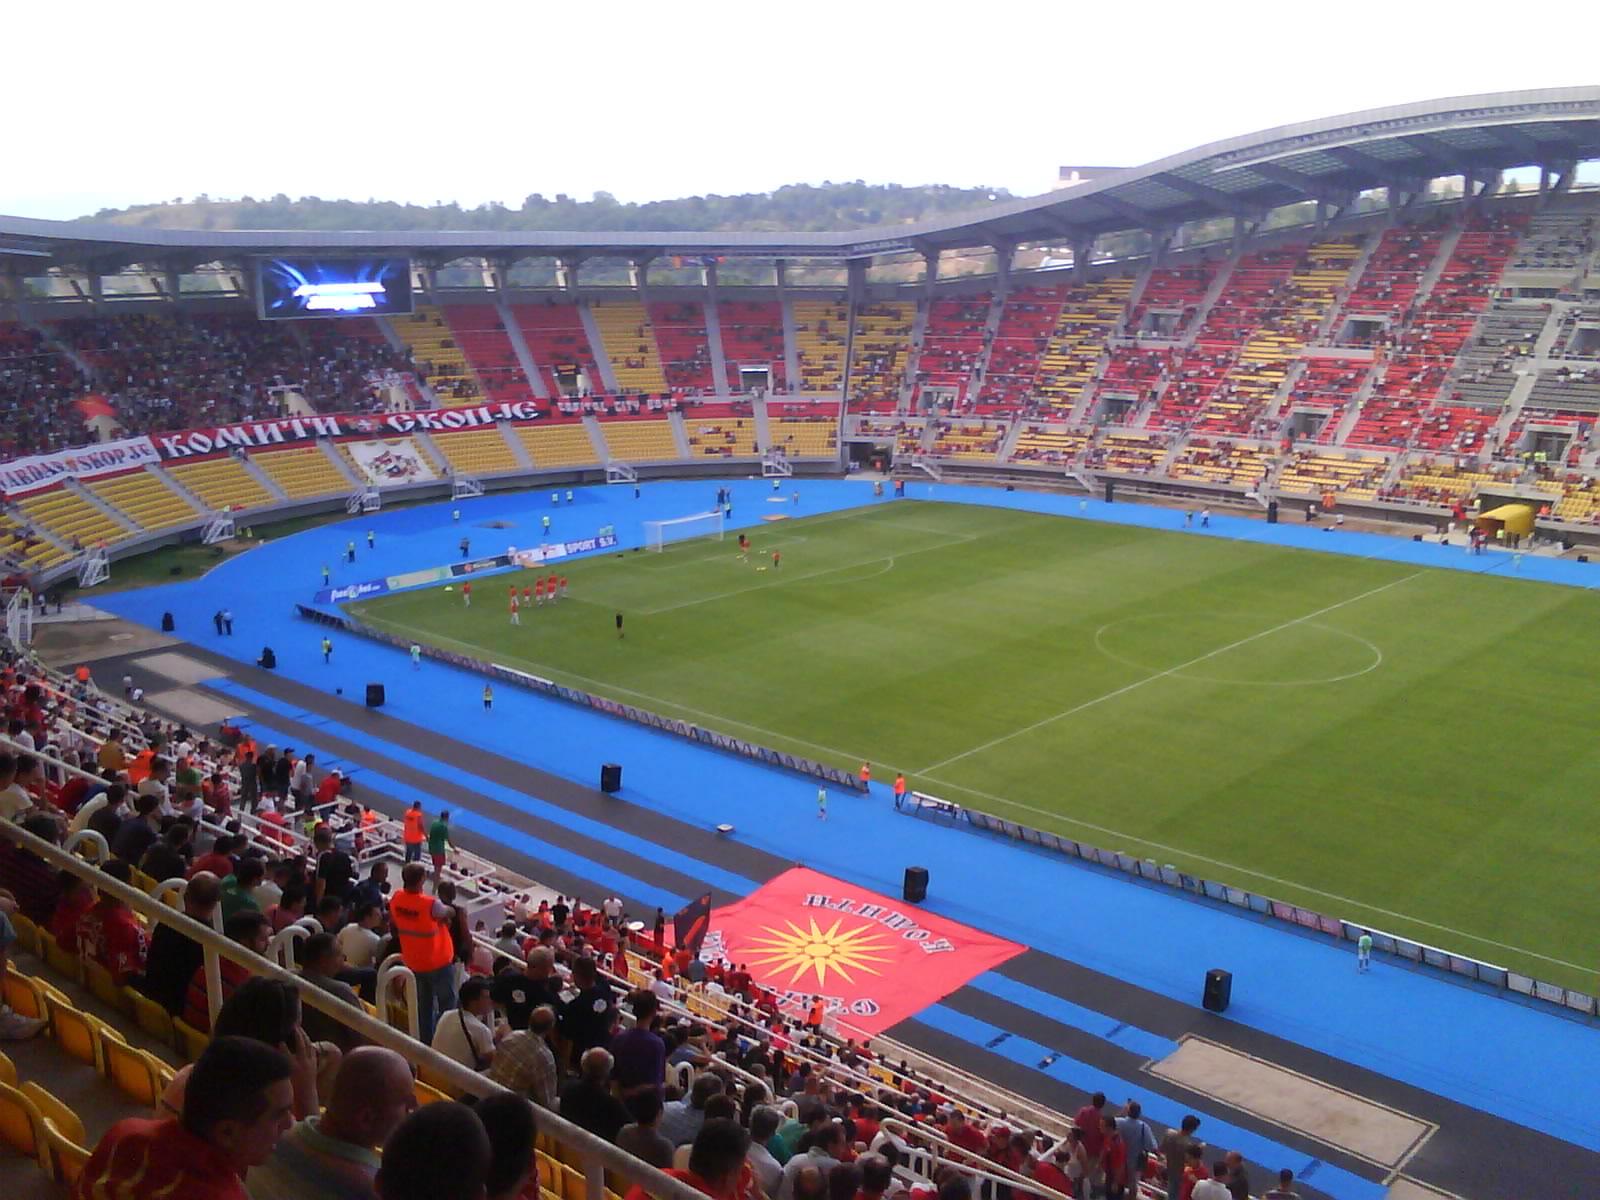 Philip II Arena